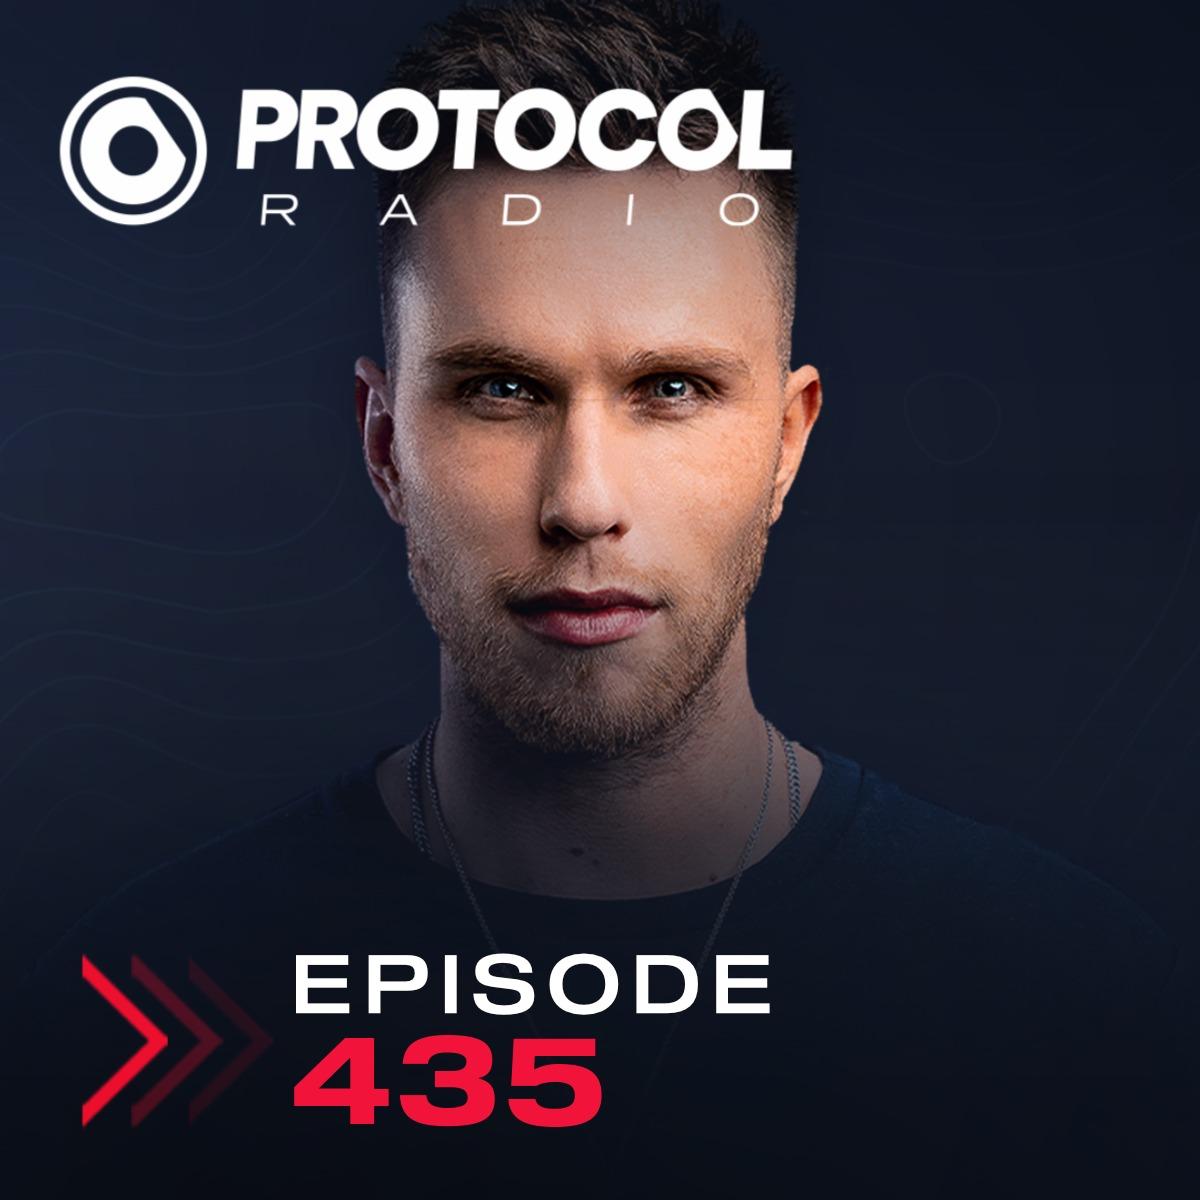 Nicky Romero presents: Protocol Radio #435